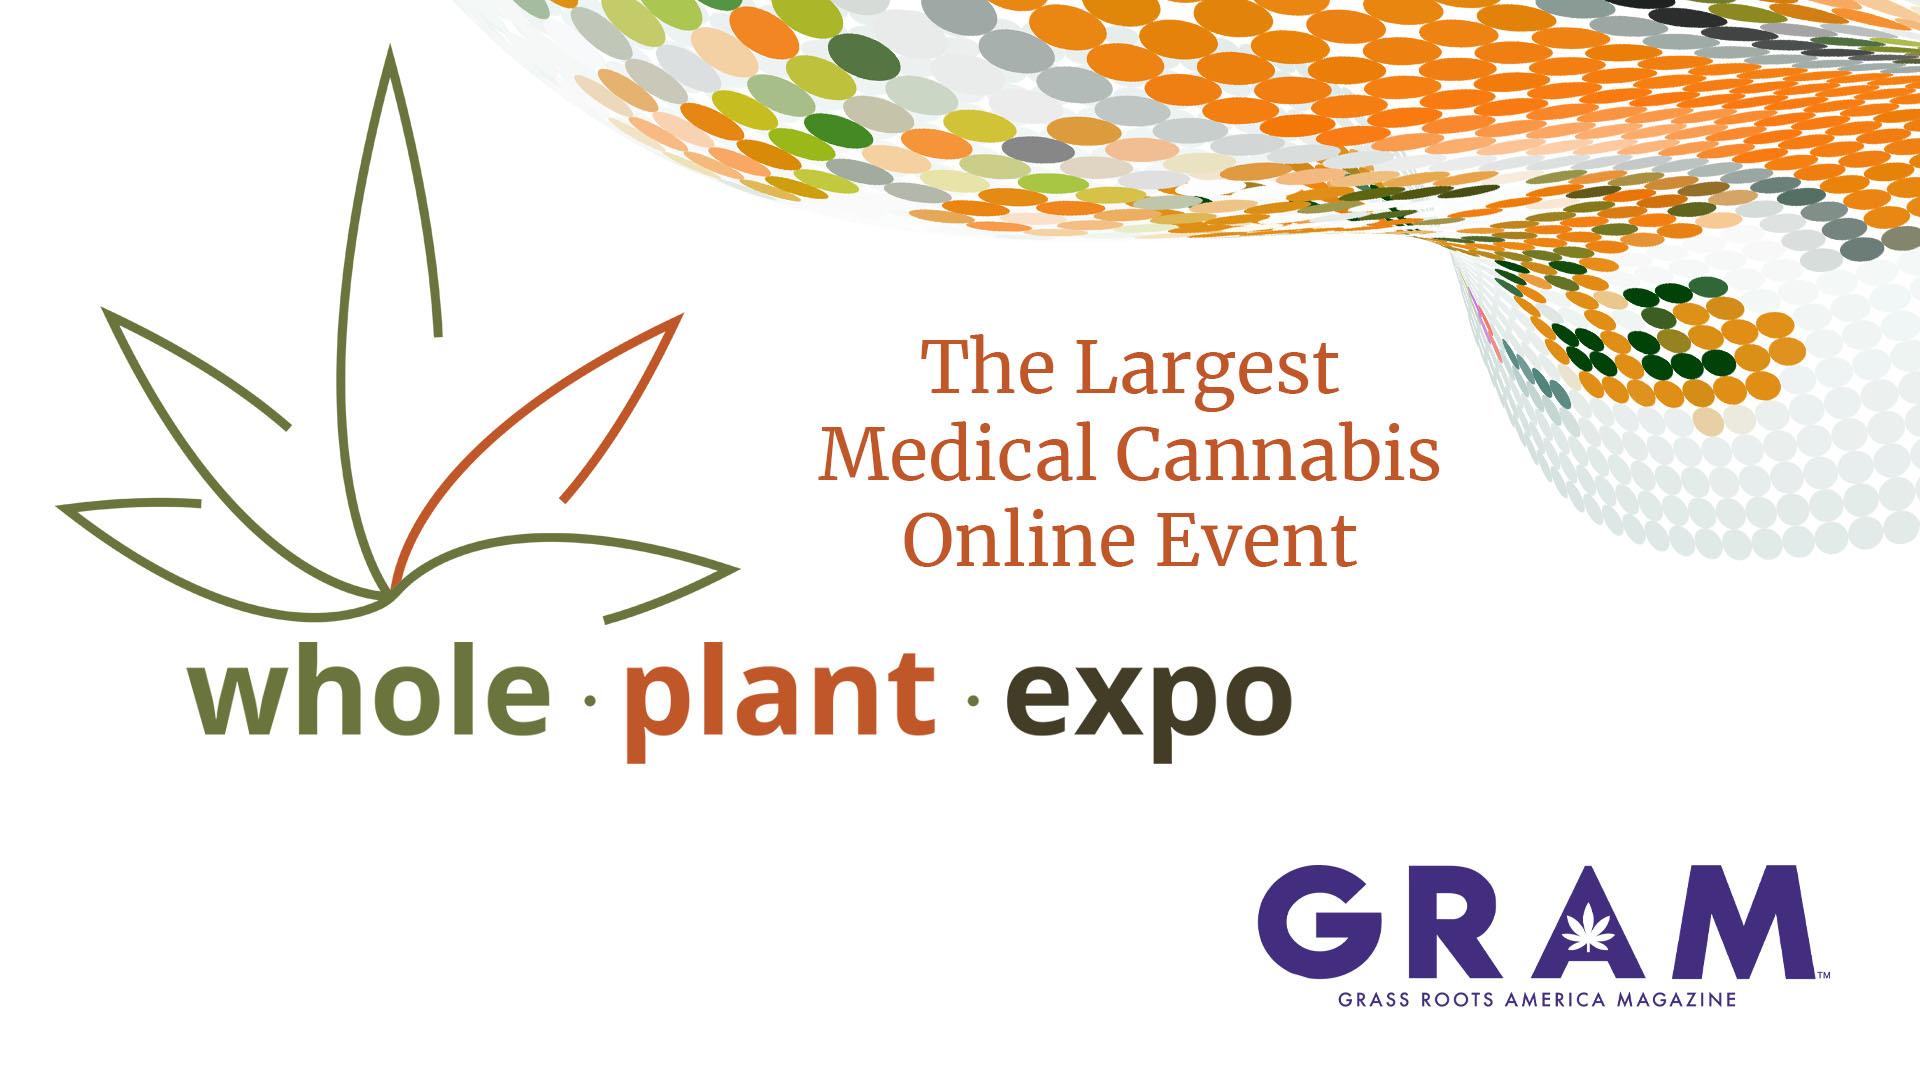 Whole Plant Expo GRAM Discount